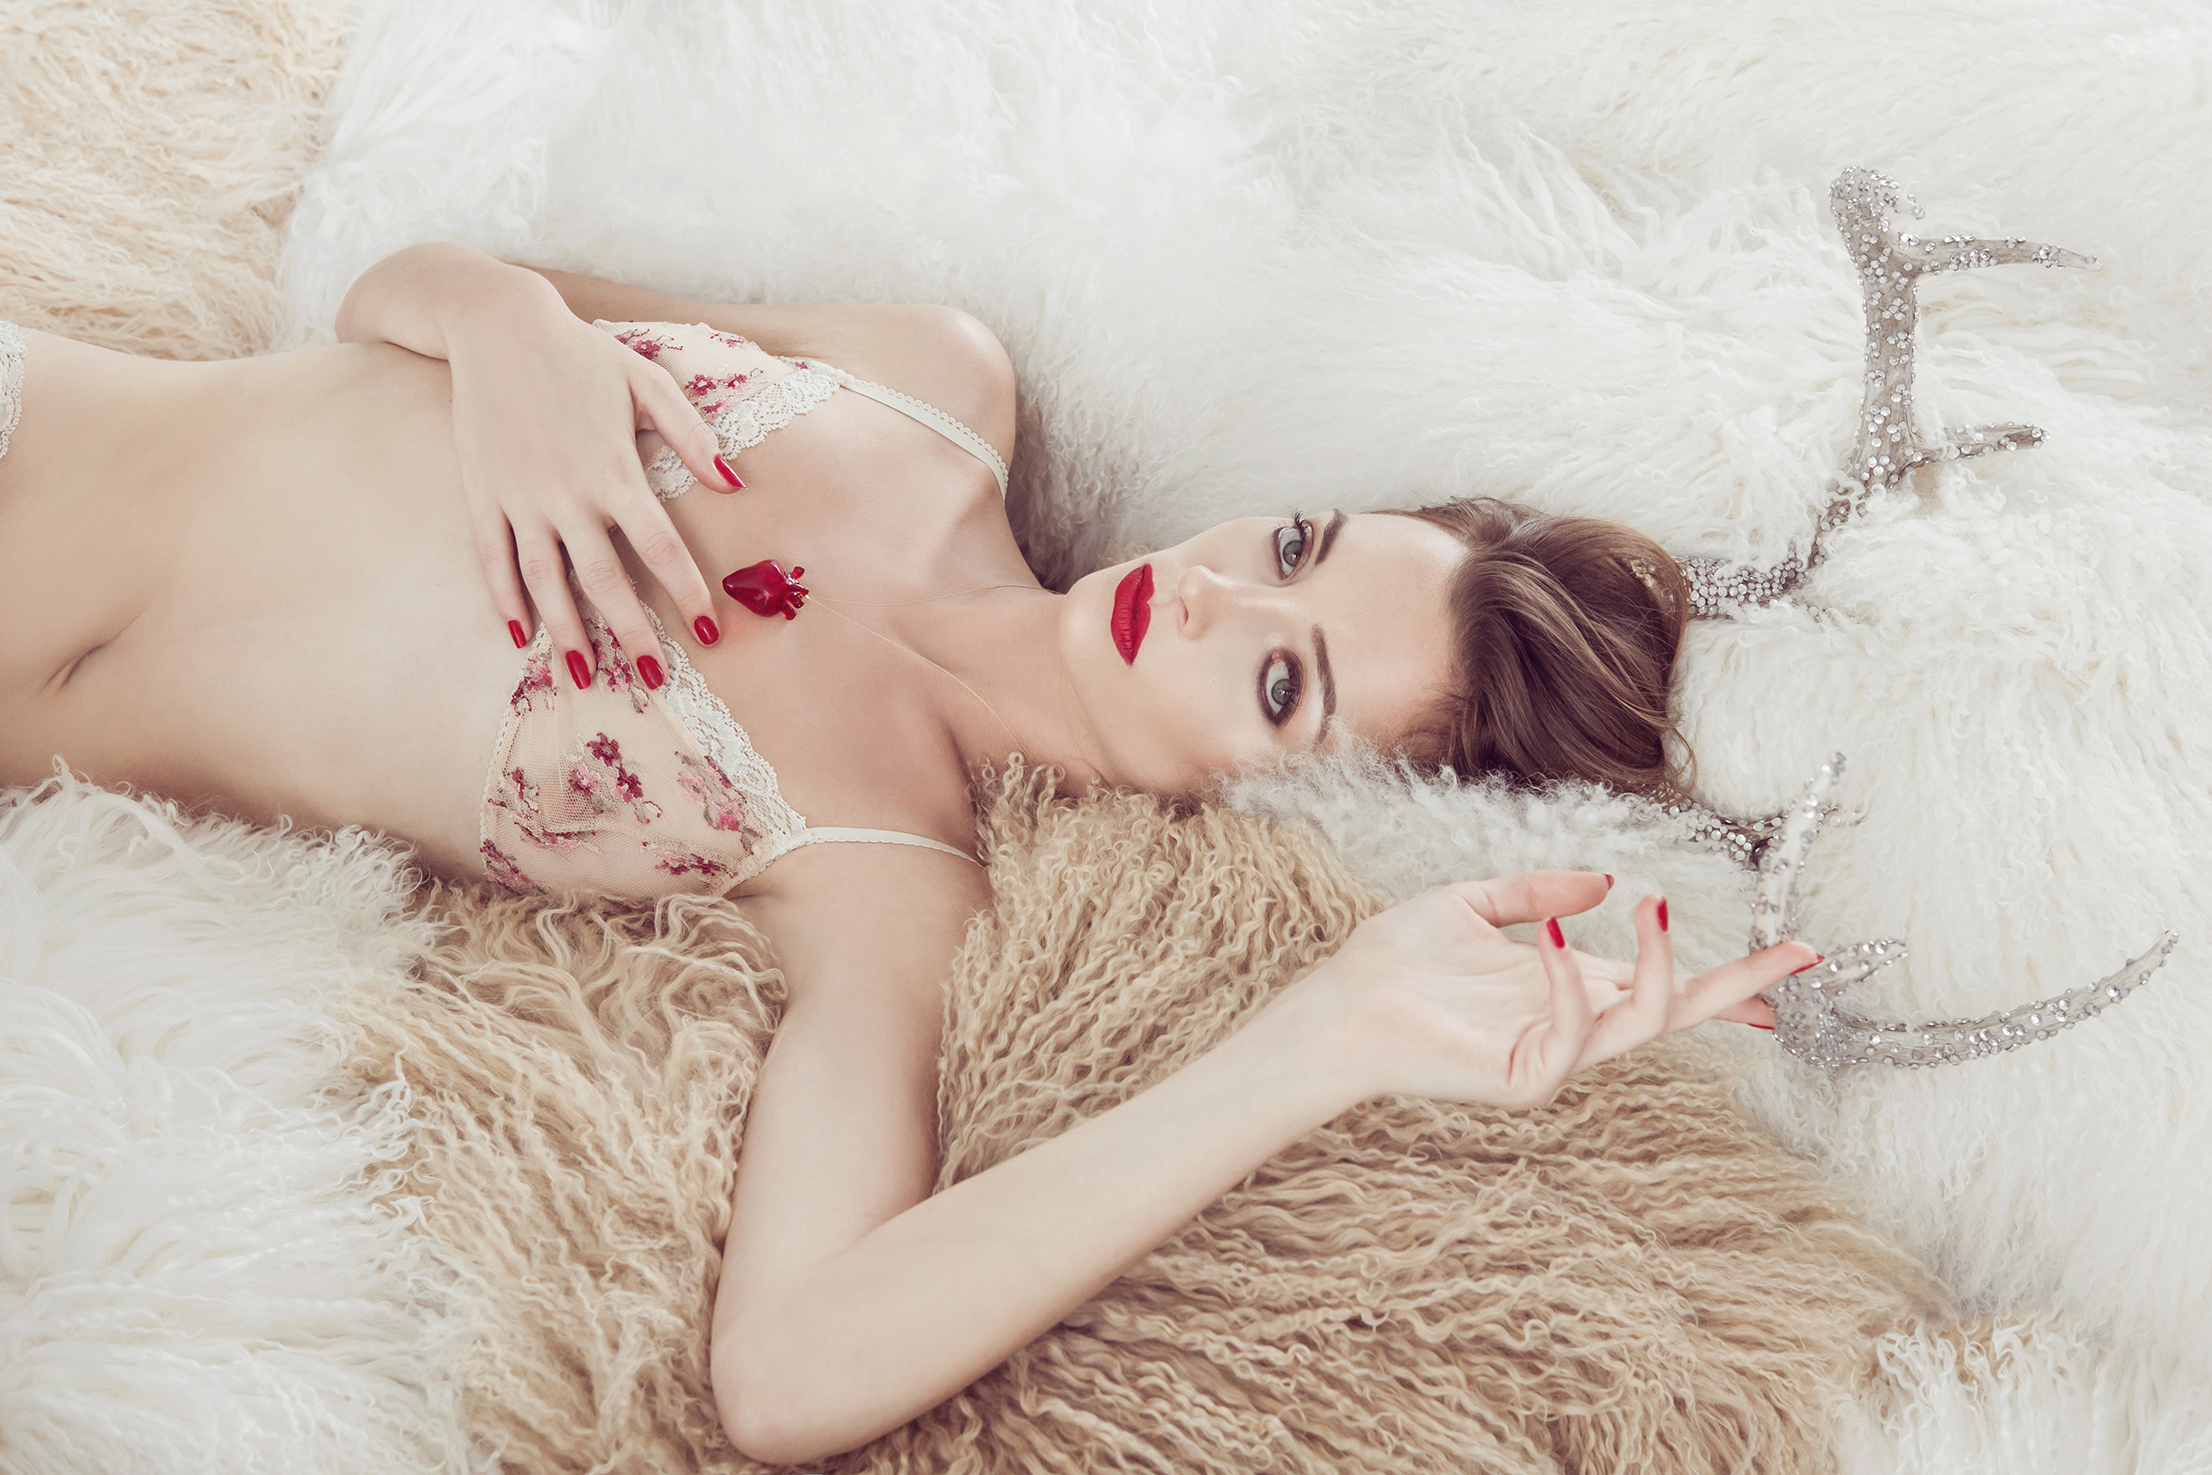 Bianca Elouise photos